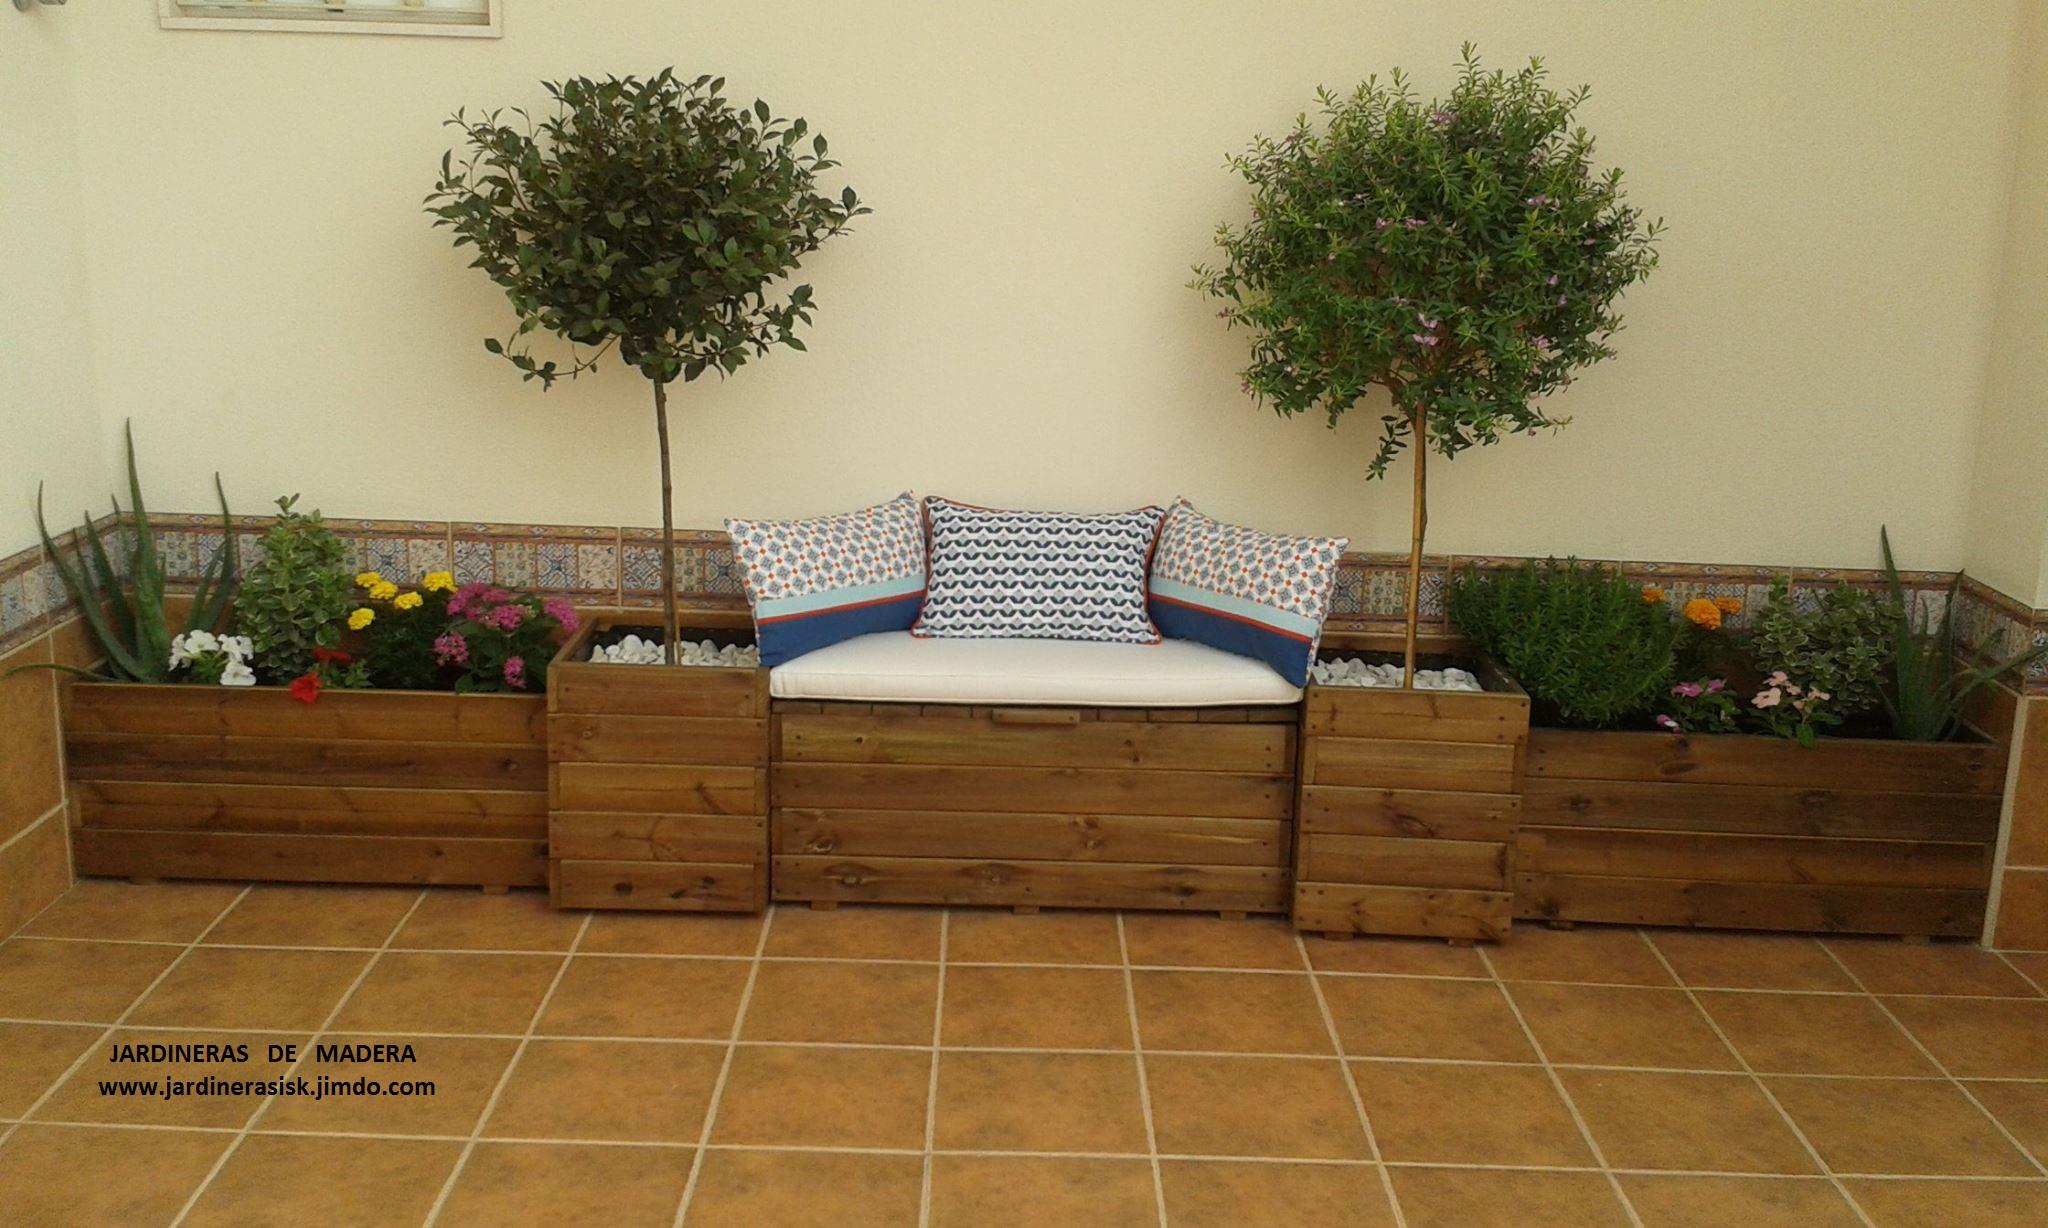 Jardineras al autoclave exterior jardineras de madera - Jardineras de obra exterior ...